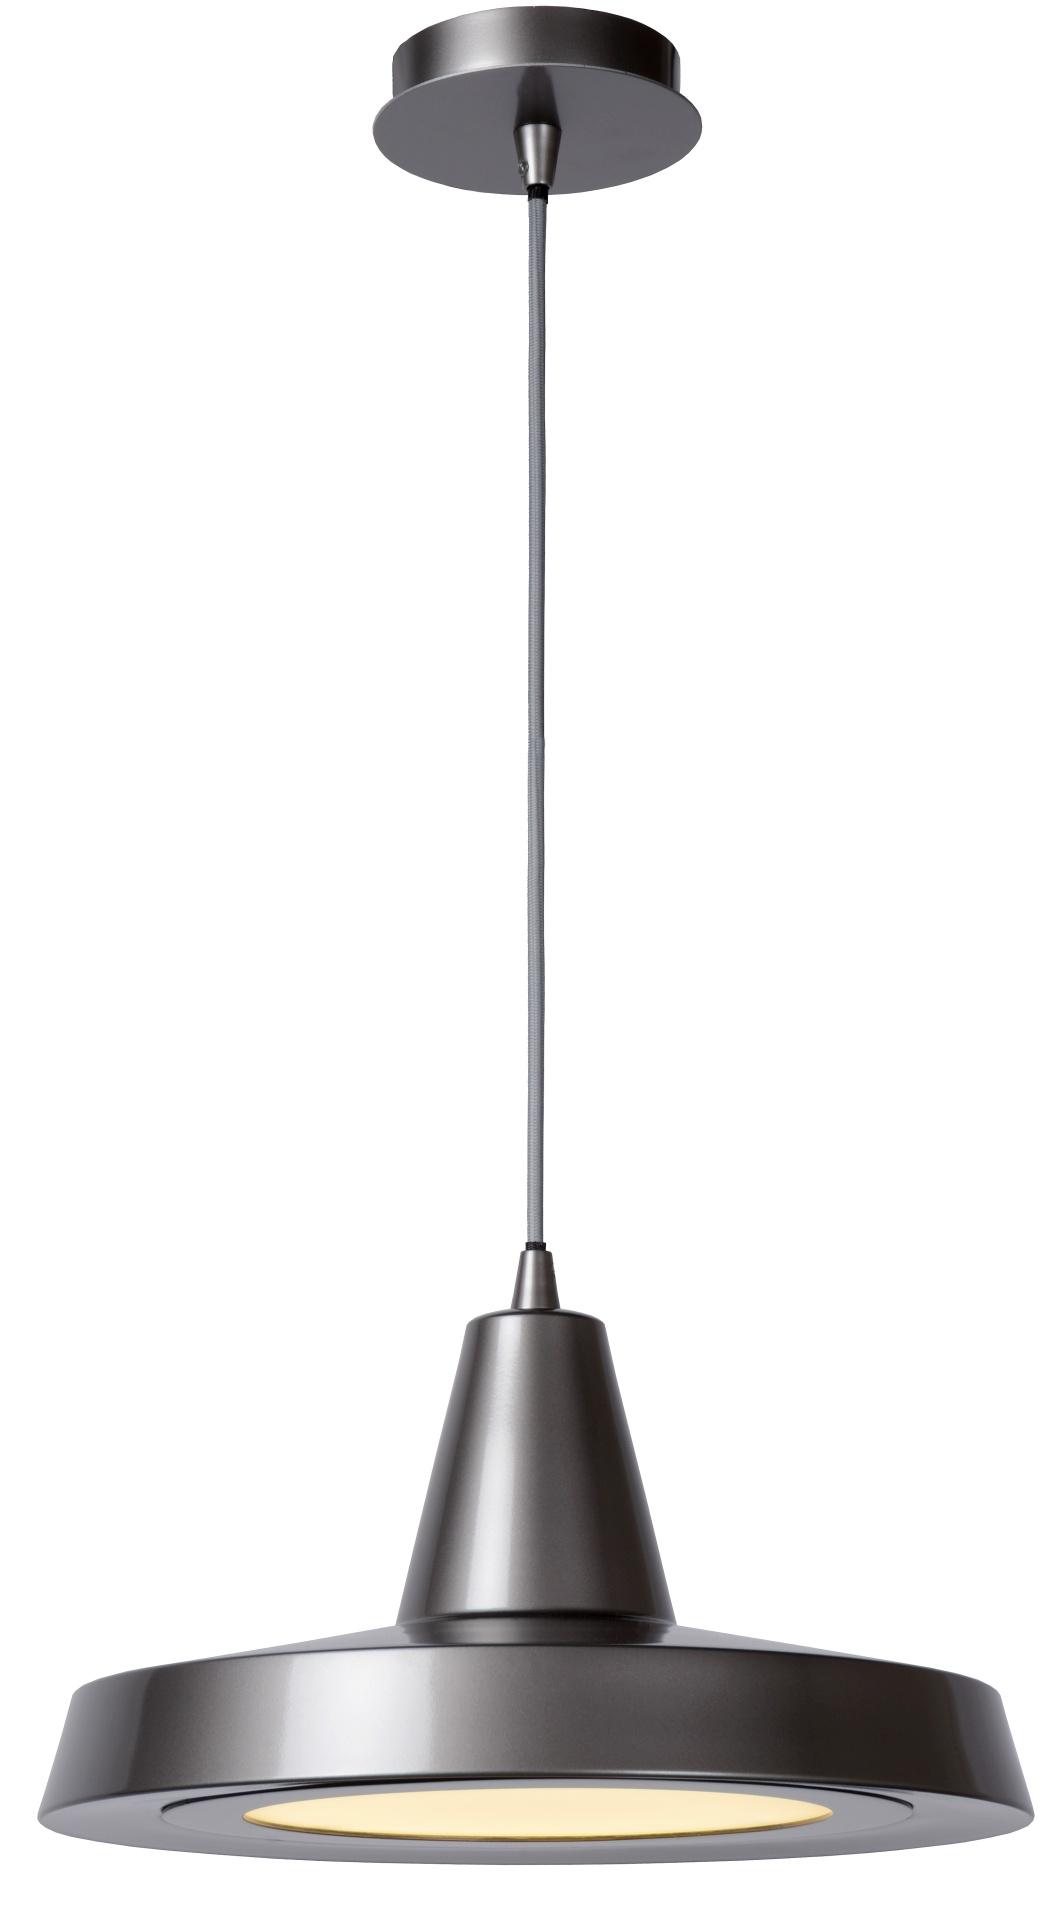 Lucide Hanglamp Solo -Ø33 Cm - H17 Cm - LED - Grijs